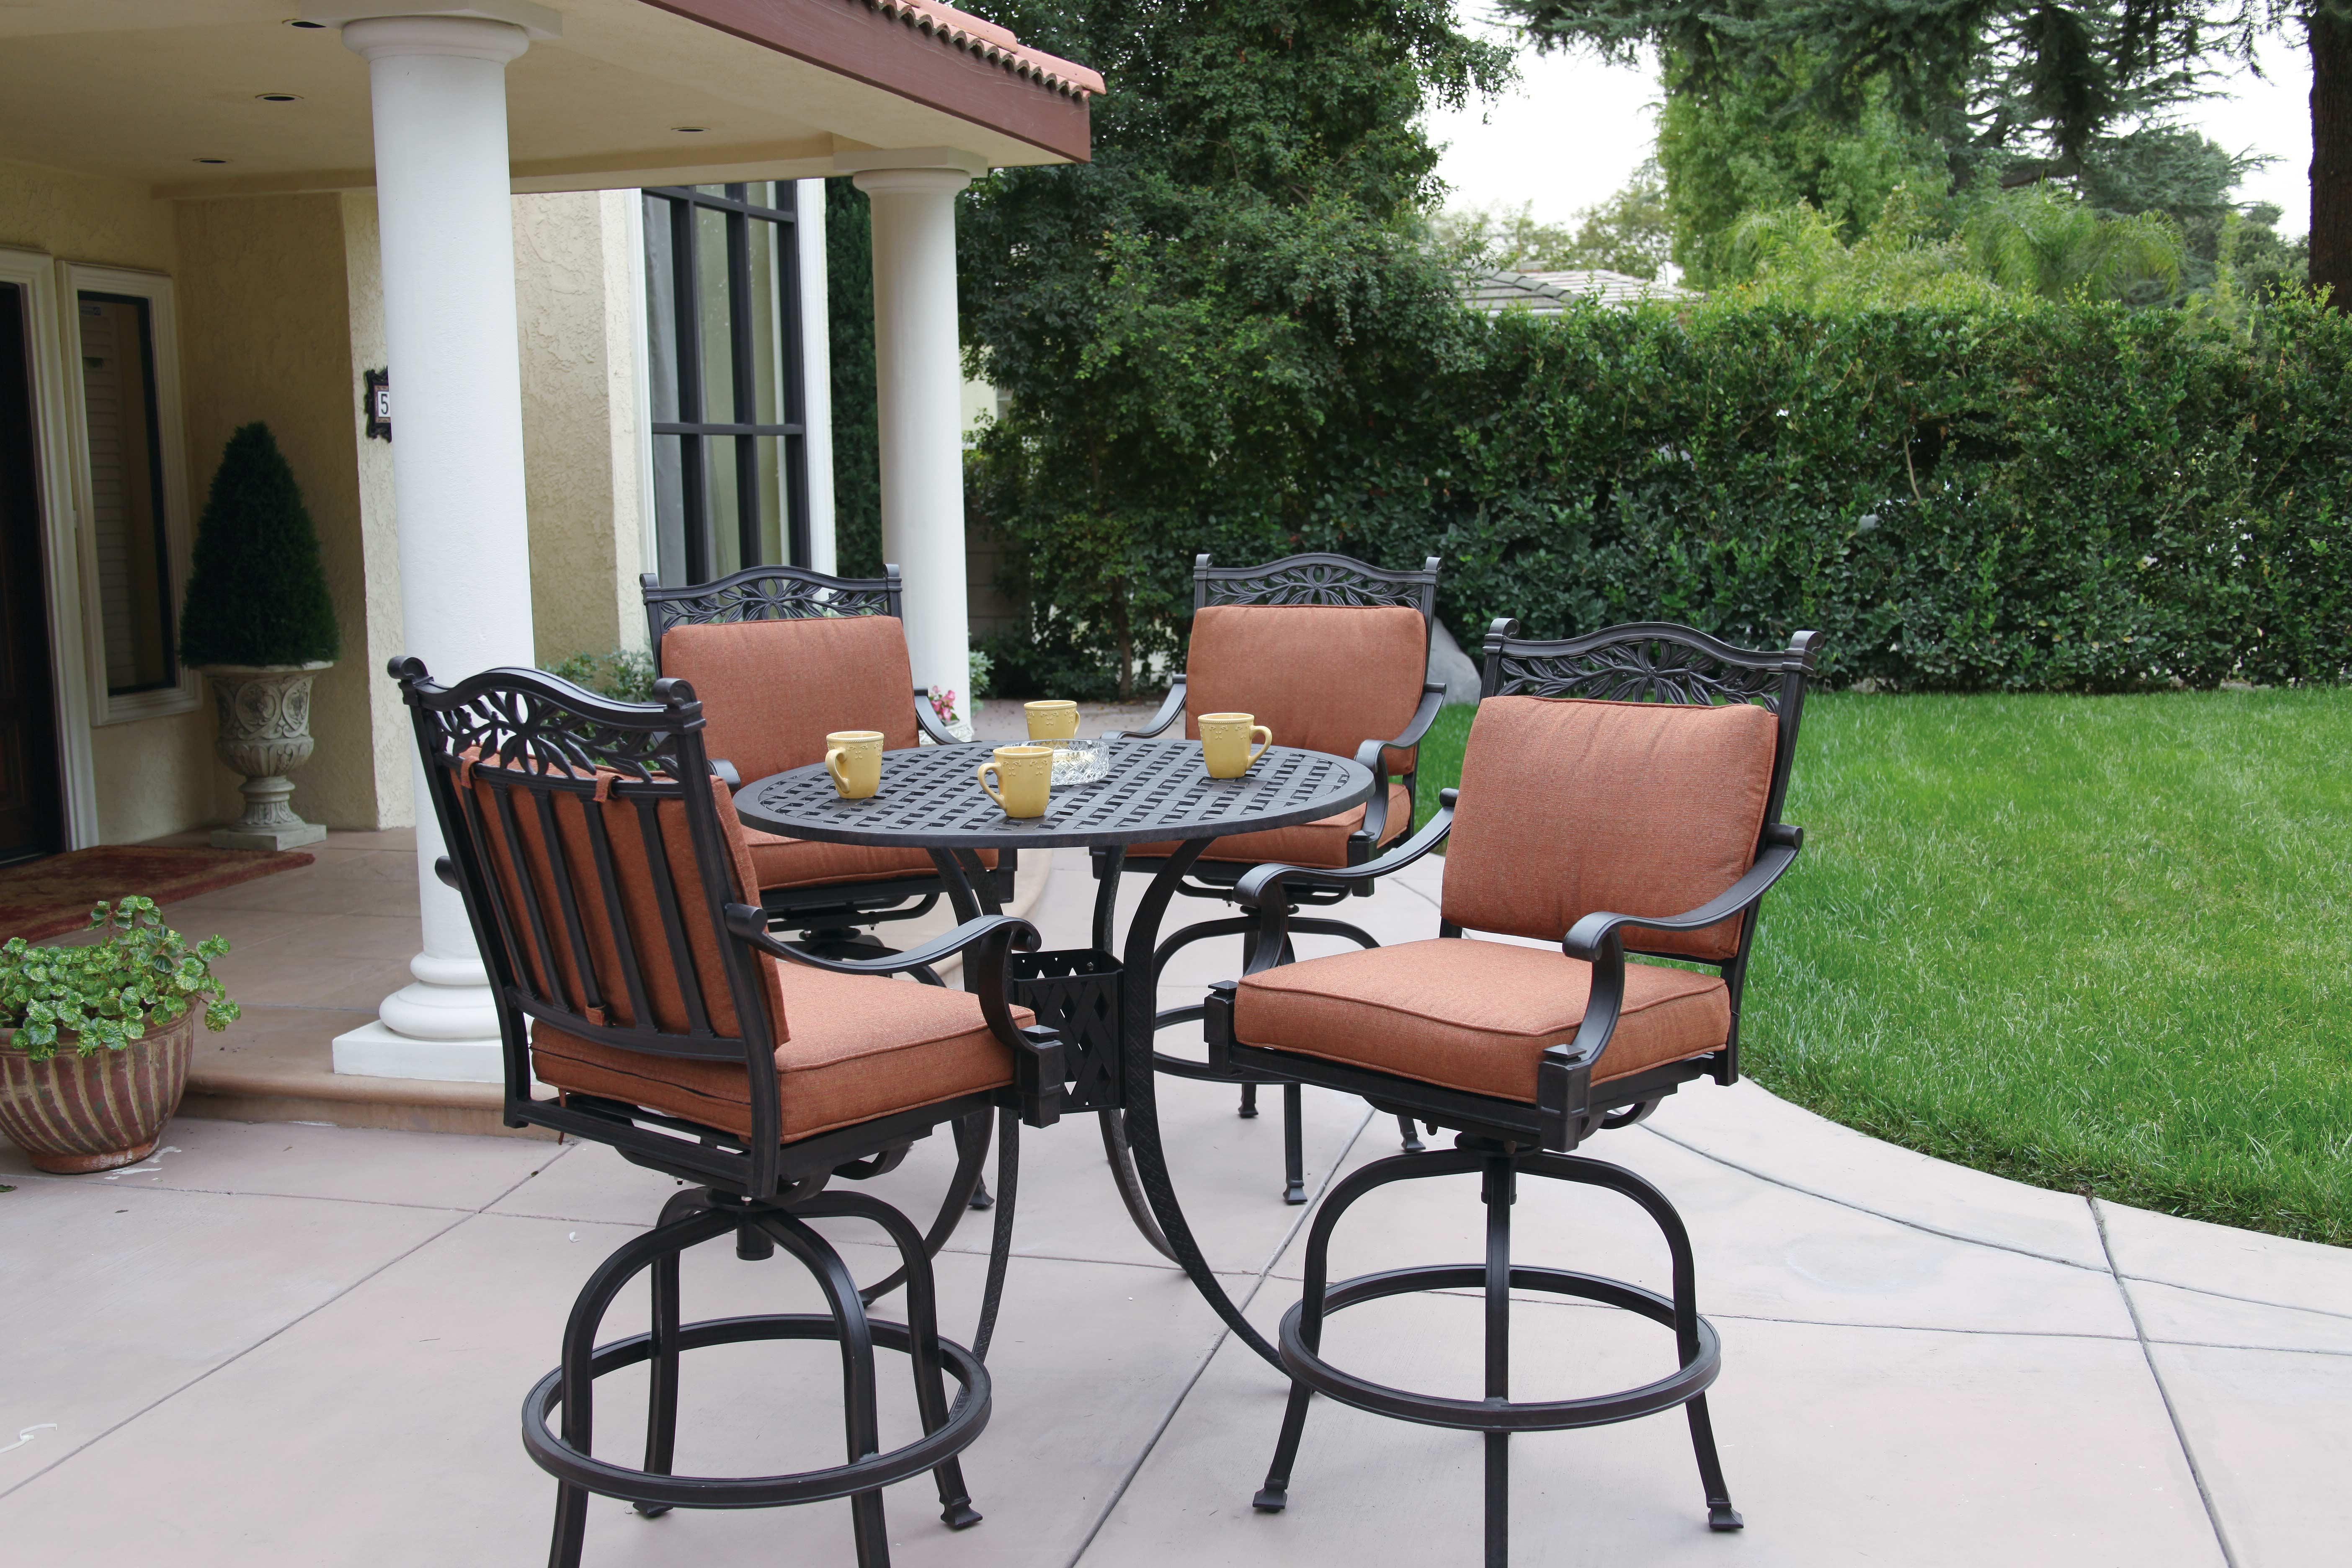 patio furniture dining set cast aluminum 42 pub table 5pc charleston